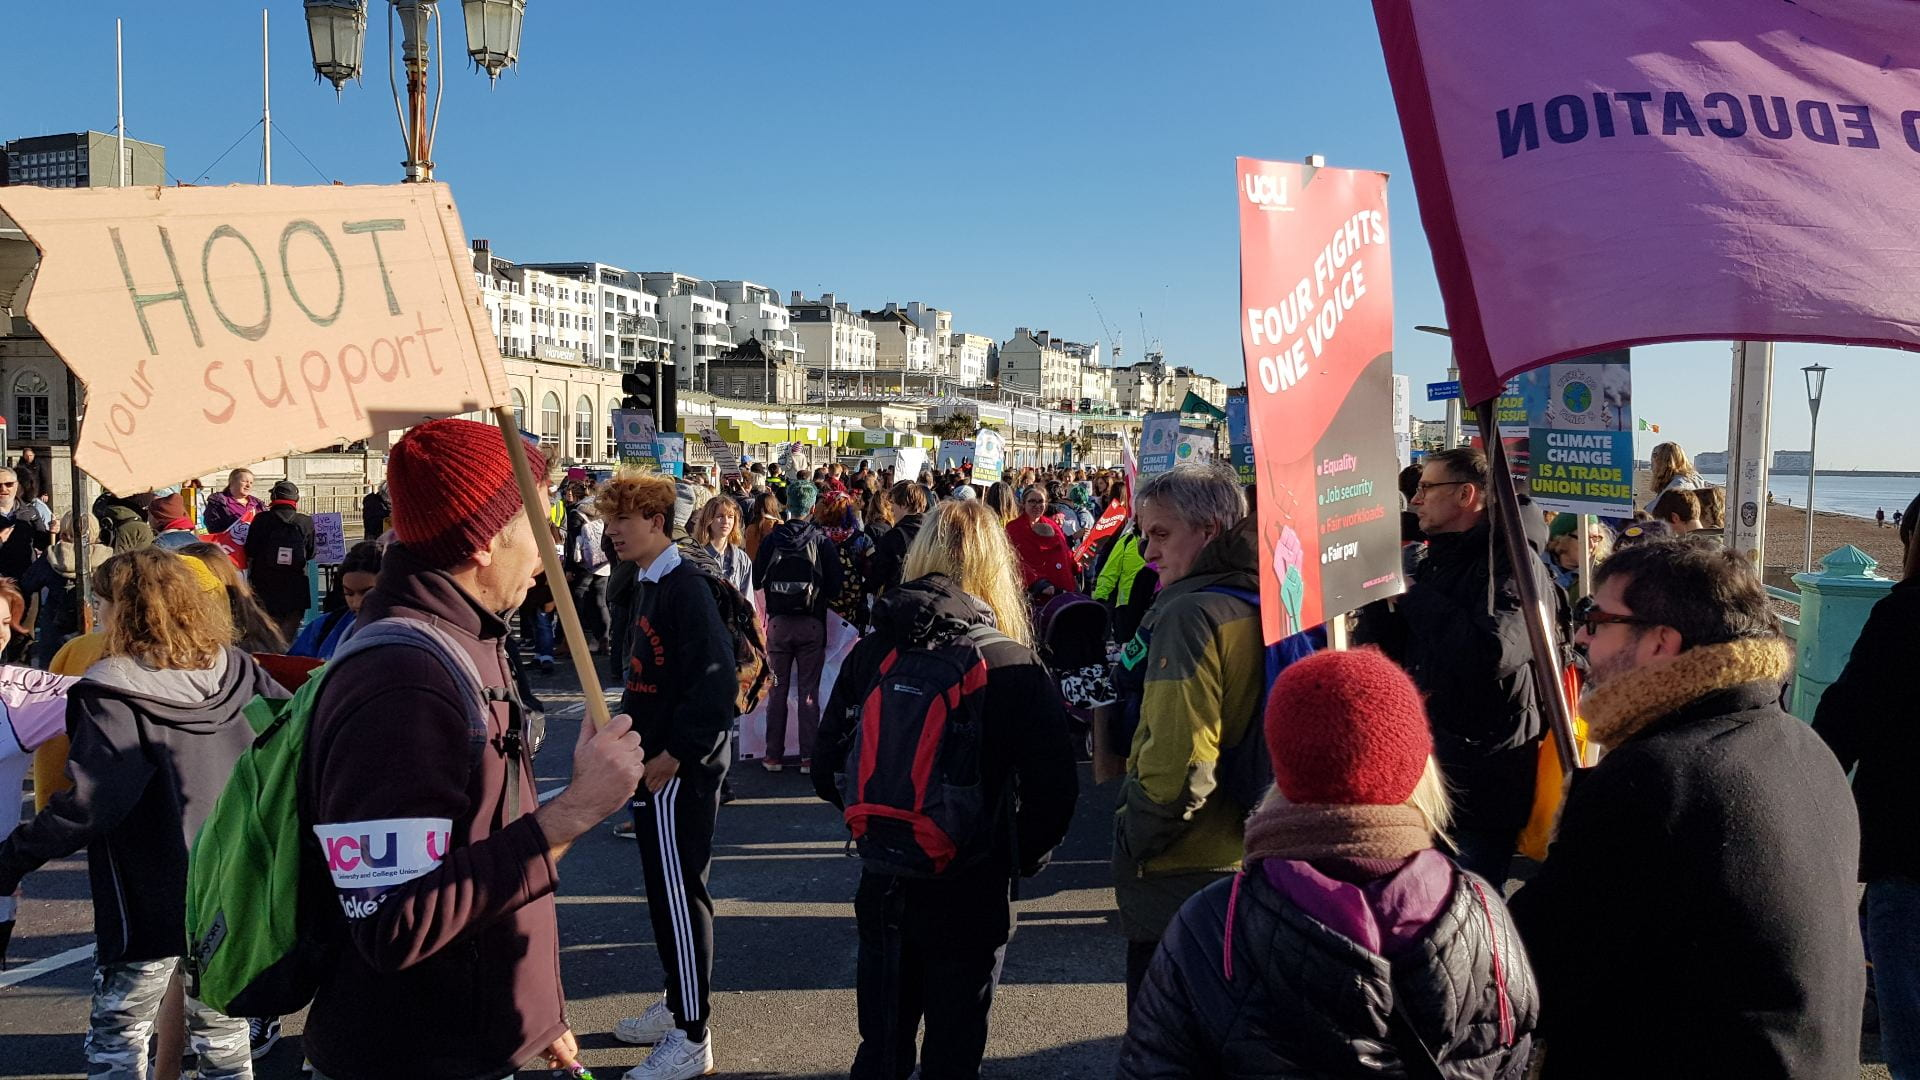 UCU members assembling before the climate strike march, Brighton November 29 2019